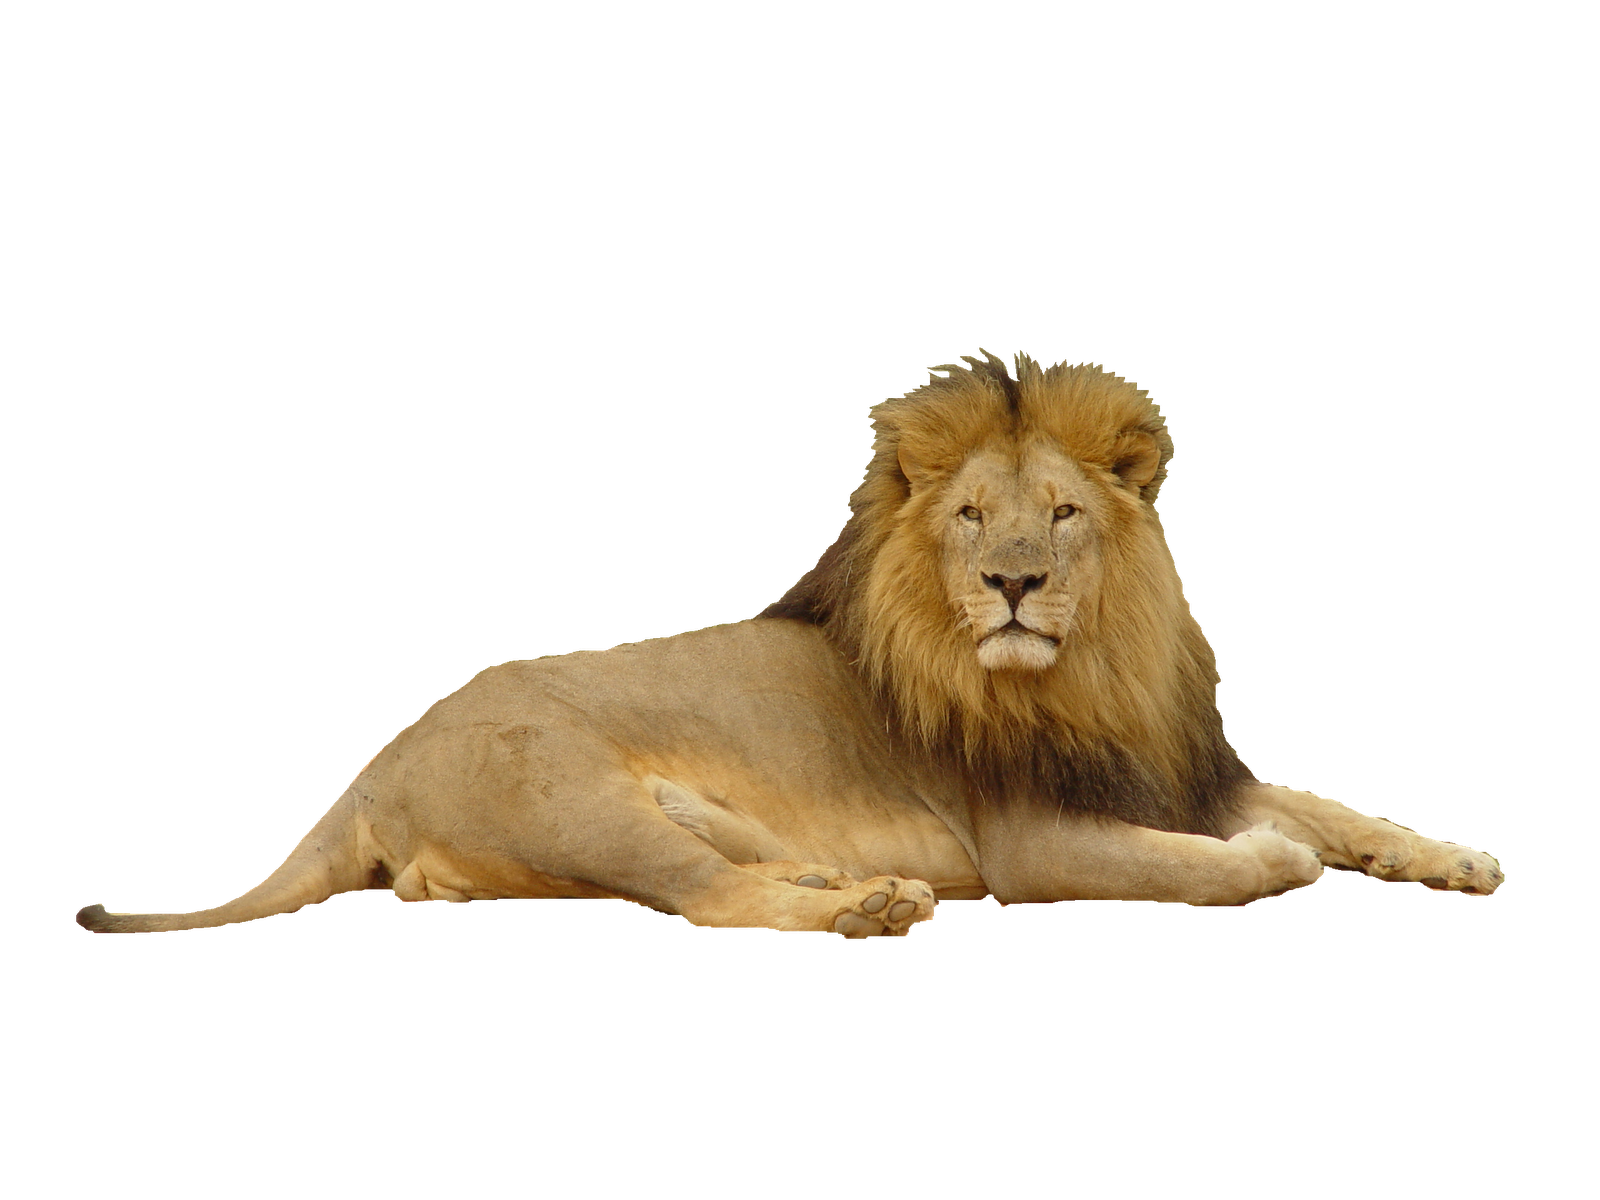 Lion clipart loin. Transparent png pictures free